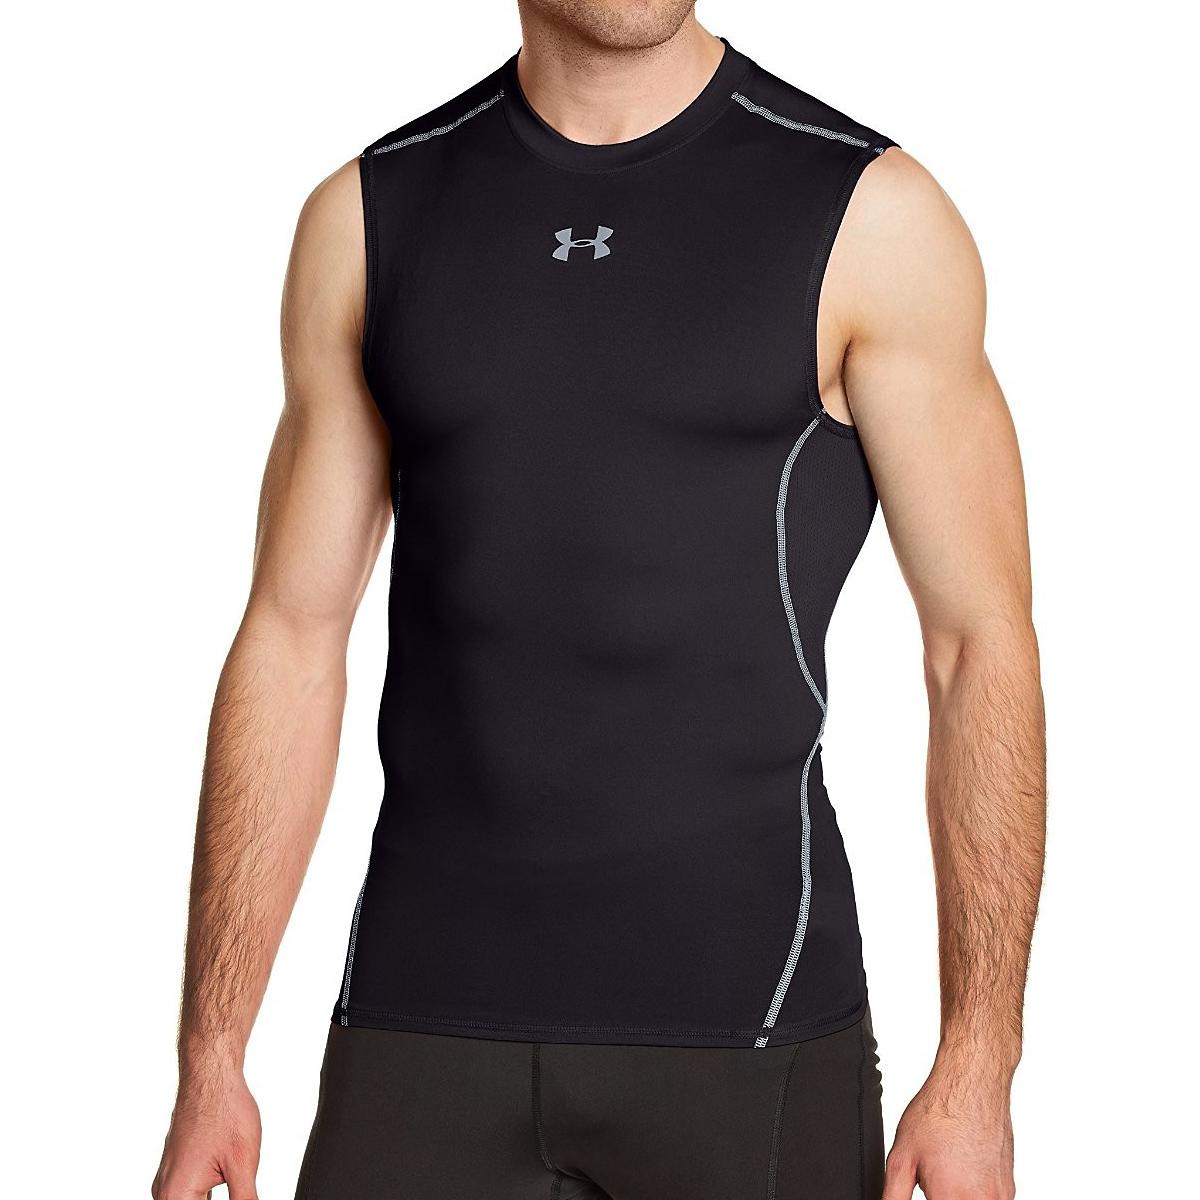 Under armour men 39 s hg armour sleeveless compression shirt for Under armour swim shirt